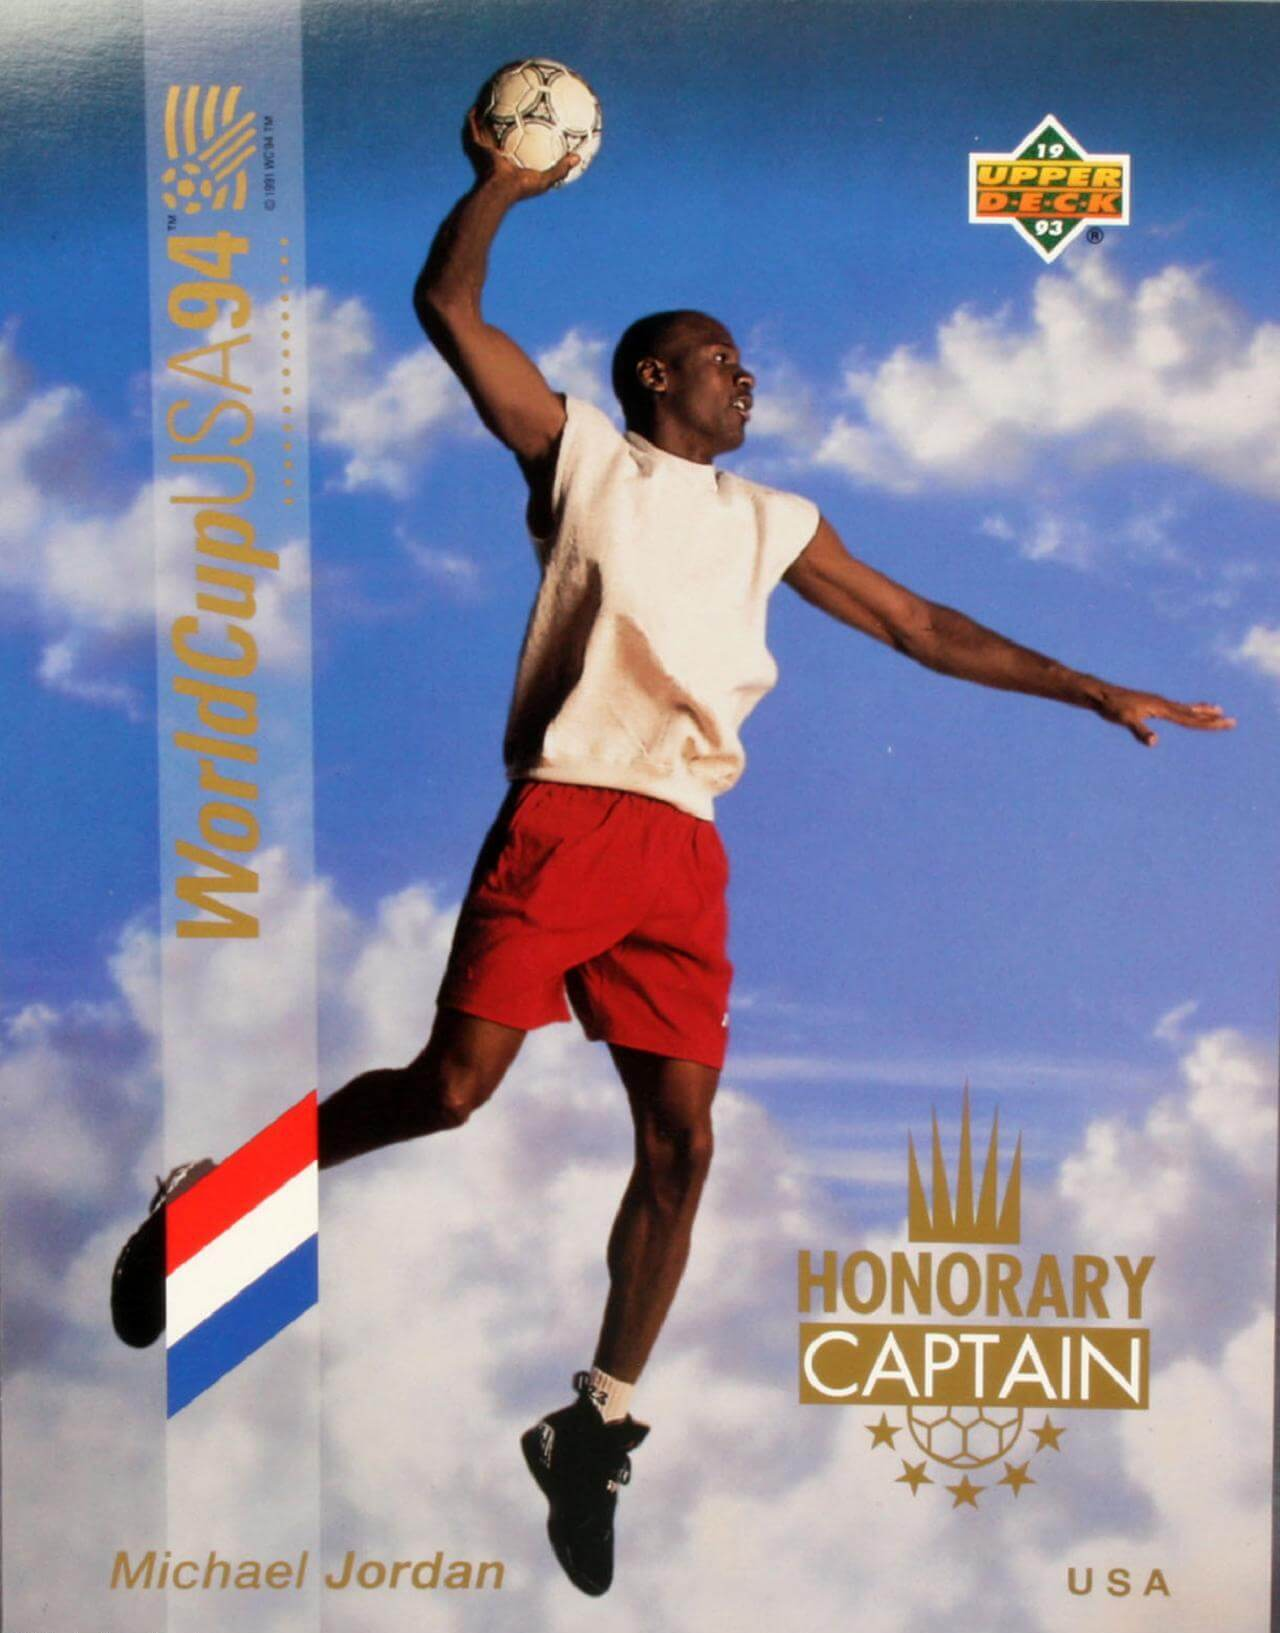 1993-94 Upper Deck UD - Michael Jordan World Cup 8.5x11 LE Photo Card